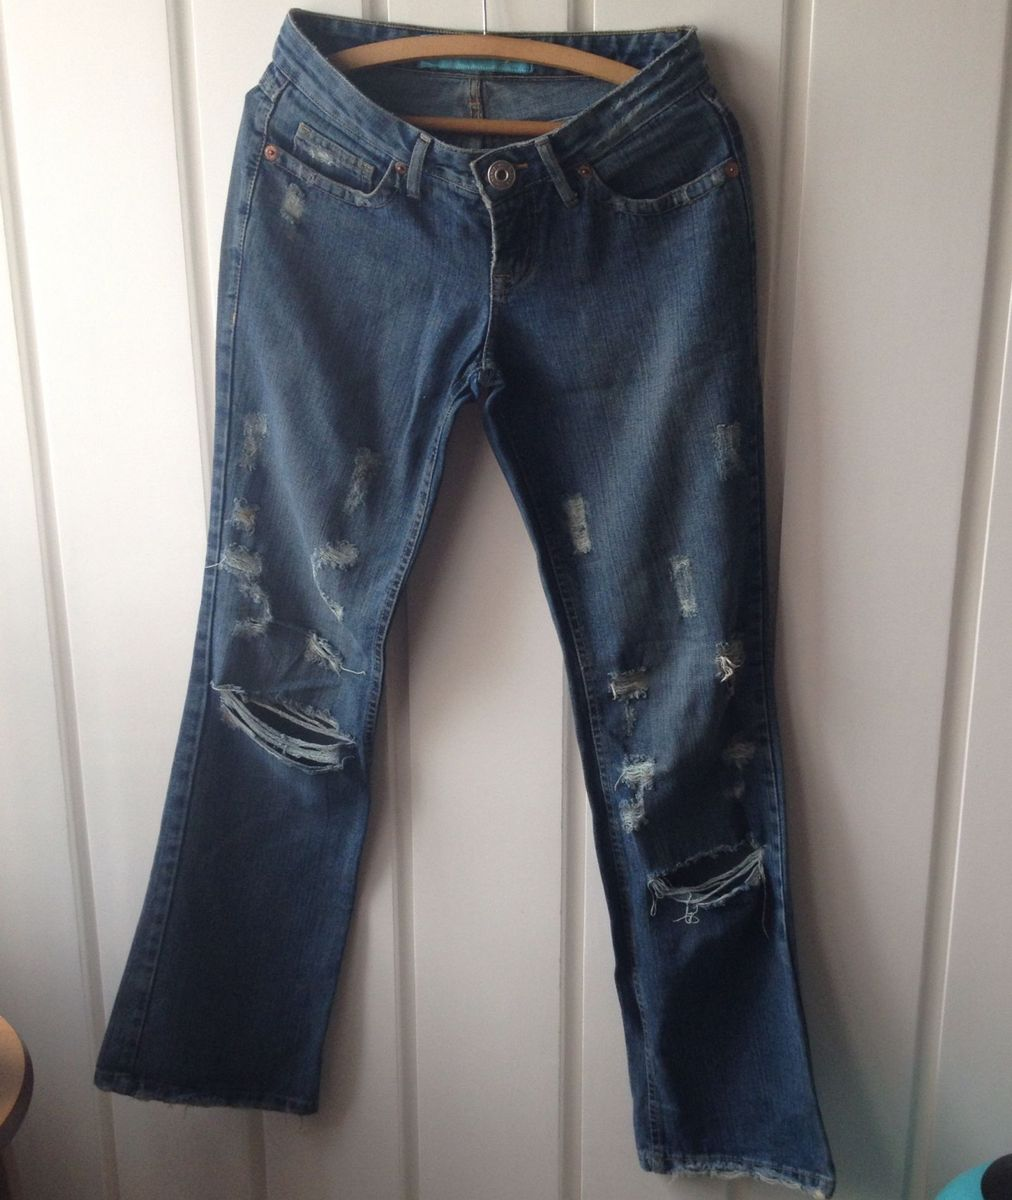 c9441d65a calca jeans flare destroyed - calças sem marca.  Czm6ly9wag90b3muzw5qb2vplmnvbs5ici9wcm9kdwn0cy81ote3nji4lzq0mmy3mjc1nzdinwqzzgnindyymdqynme3ngixztg0lmpwzw